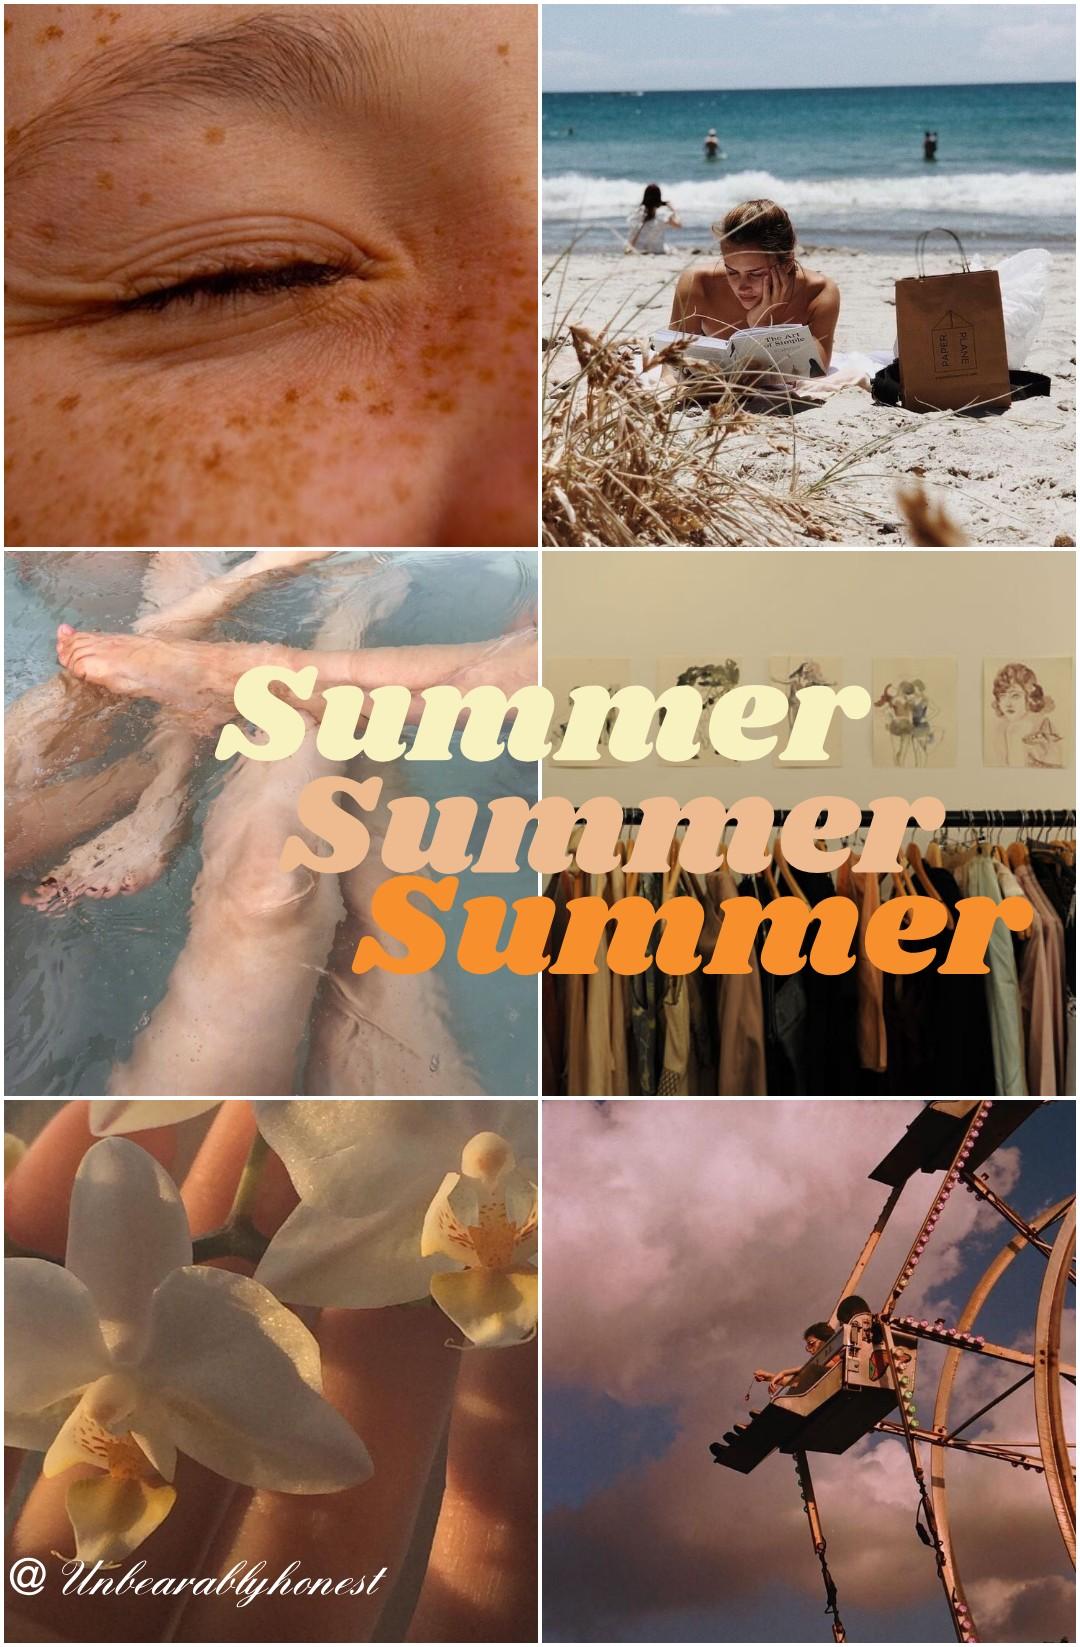 Collage by Unbearablyhonest